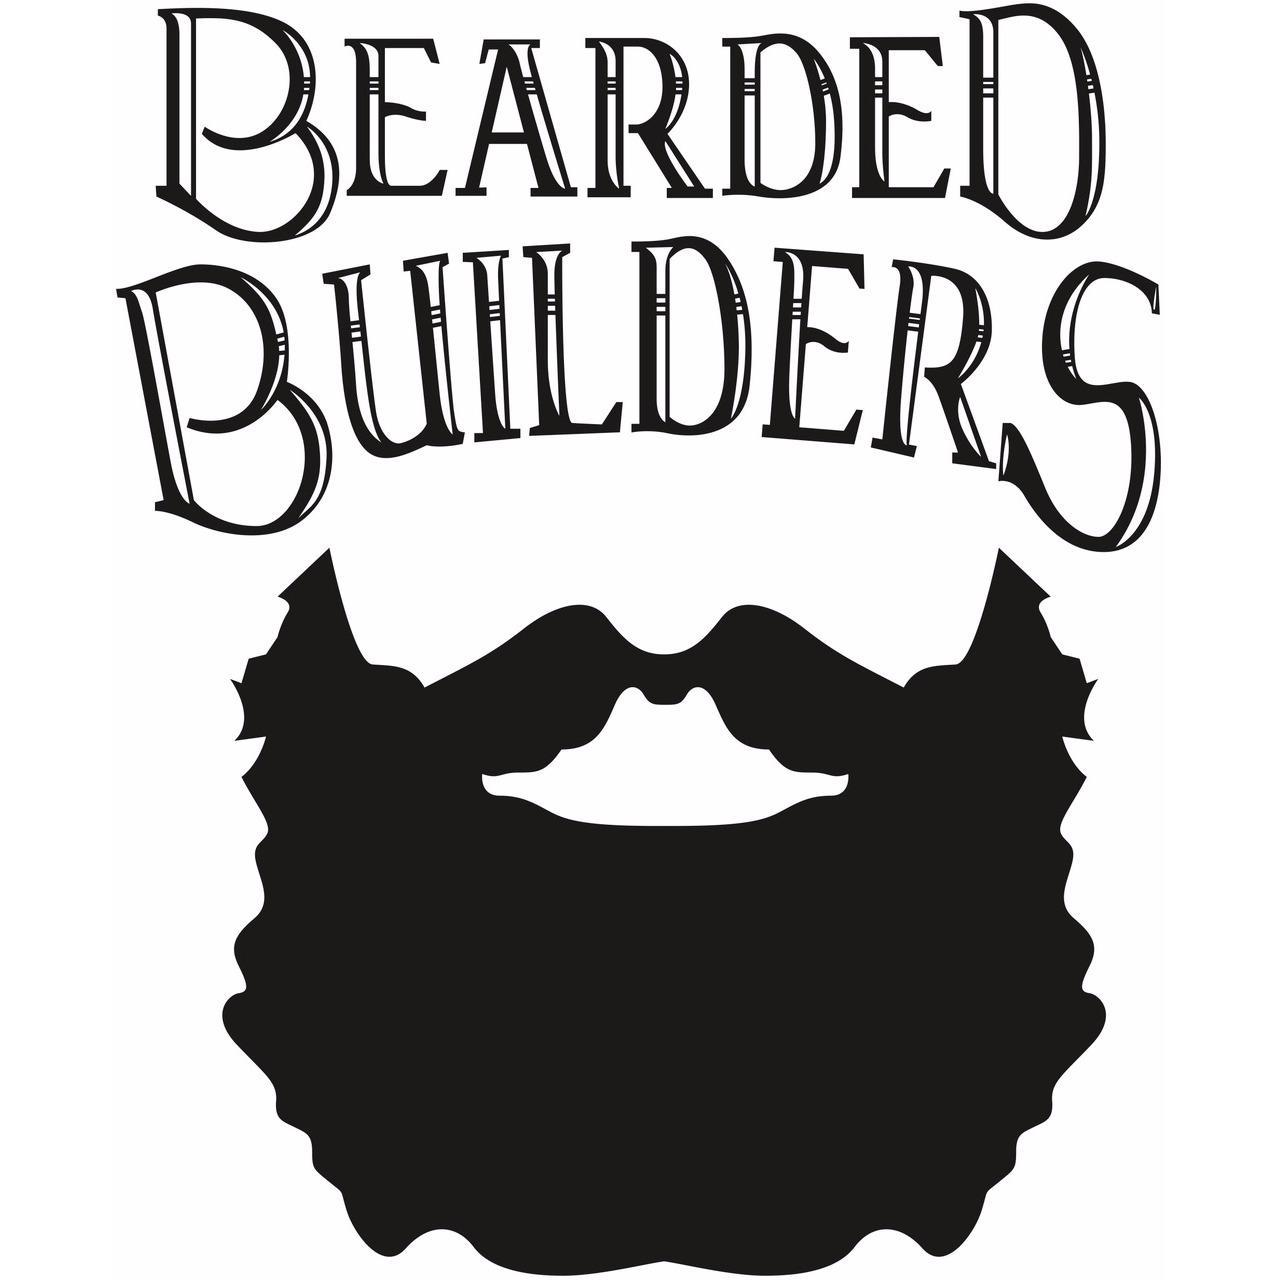 Bearded Builders Baltimore-Formerly Westmoreland Design & Build